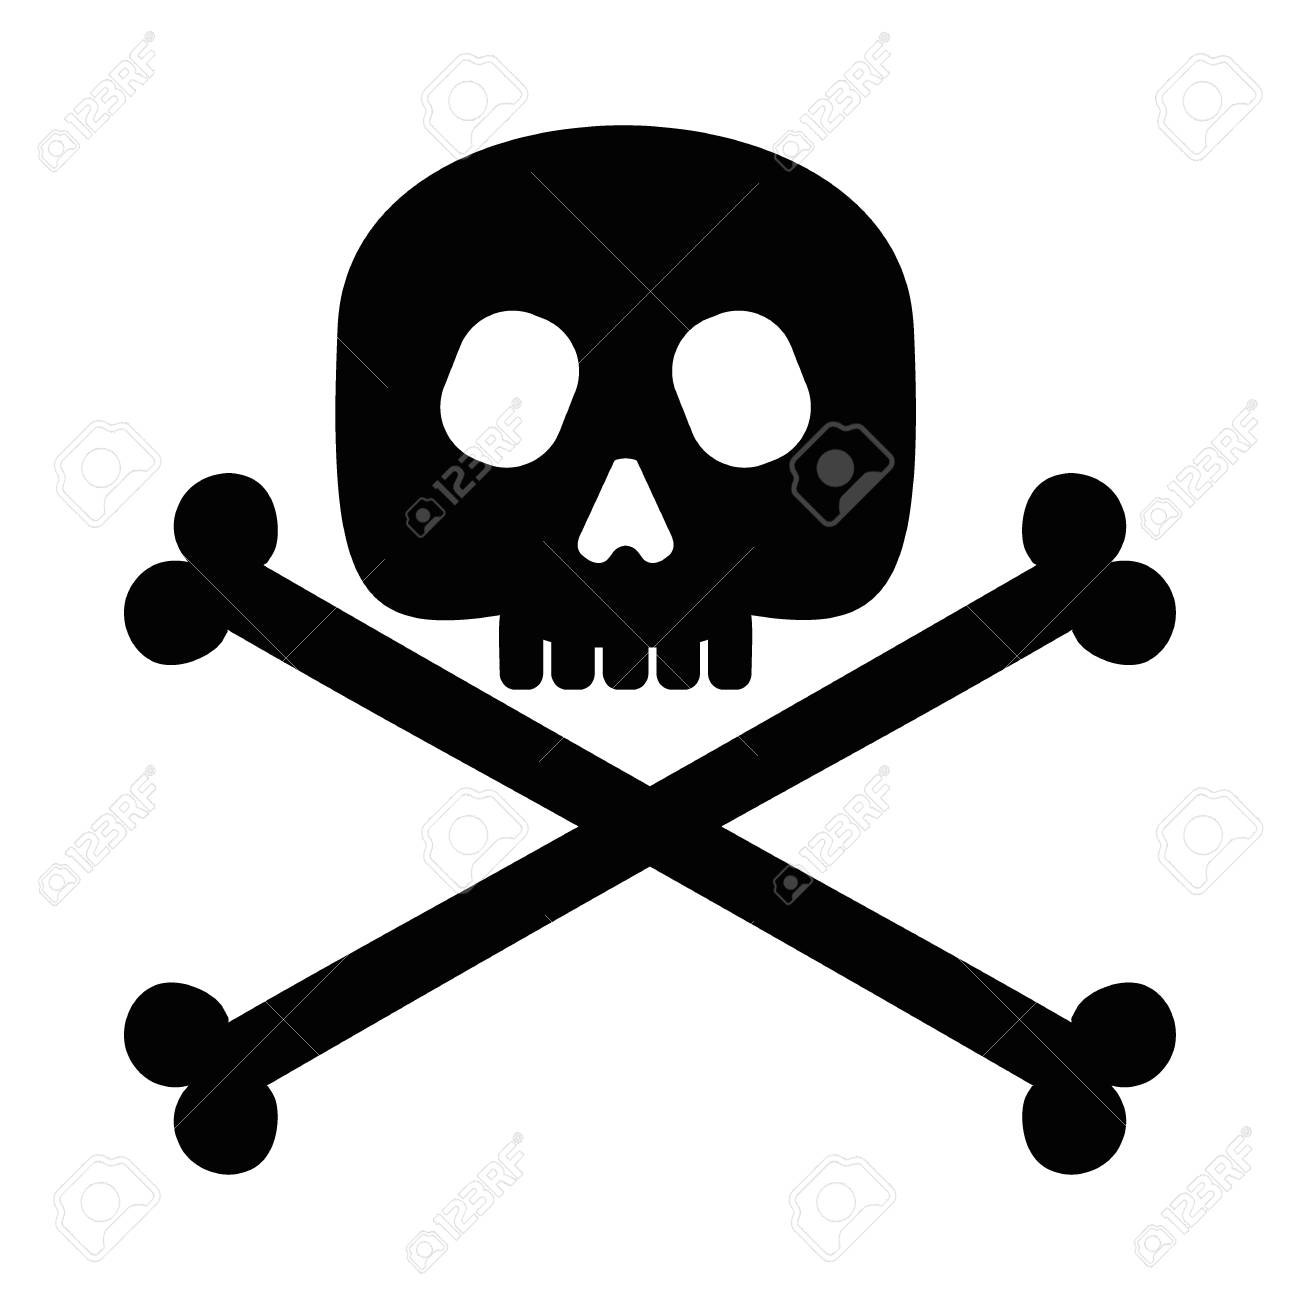 Calavera Bandera Pirata Elemento De Diseño De Halloween